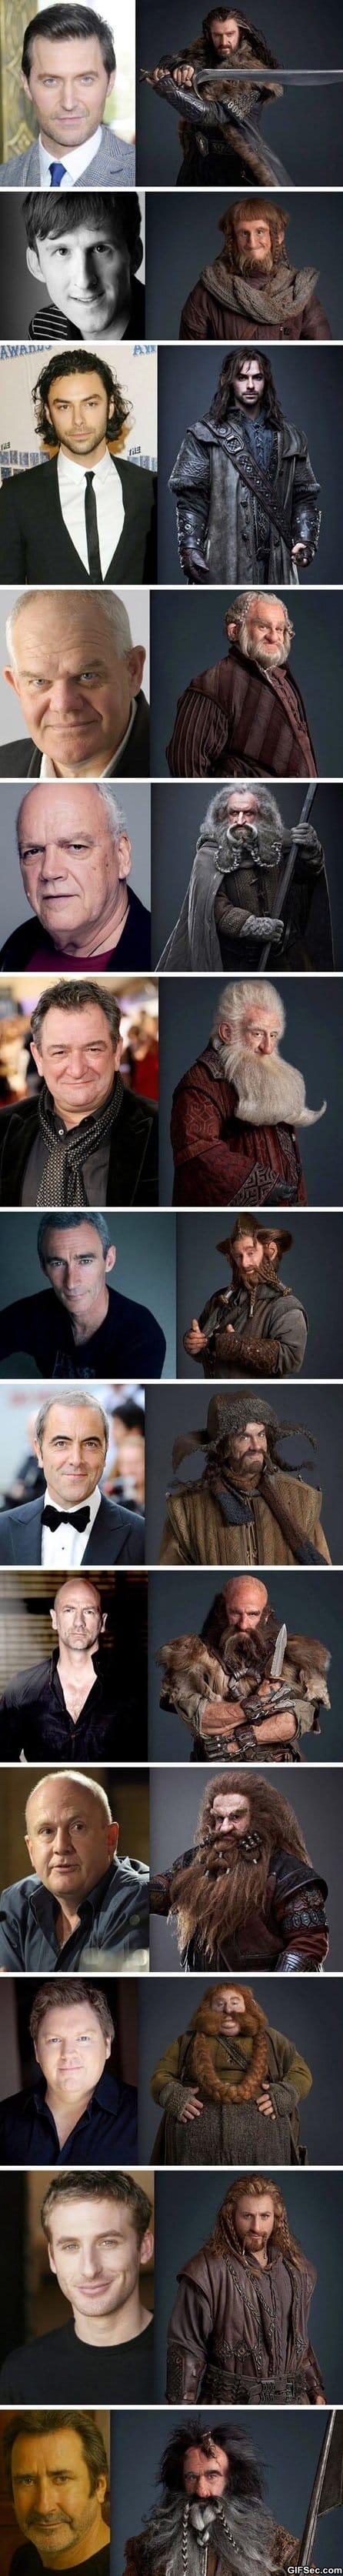 the-hobbit-dwarves-pre-and-post-make-up